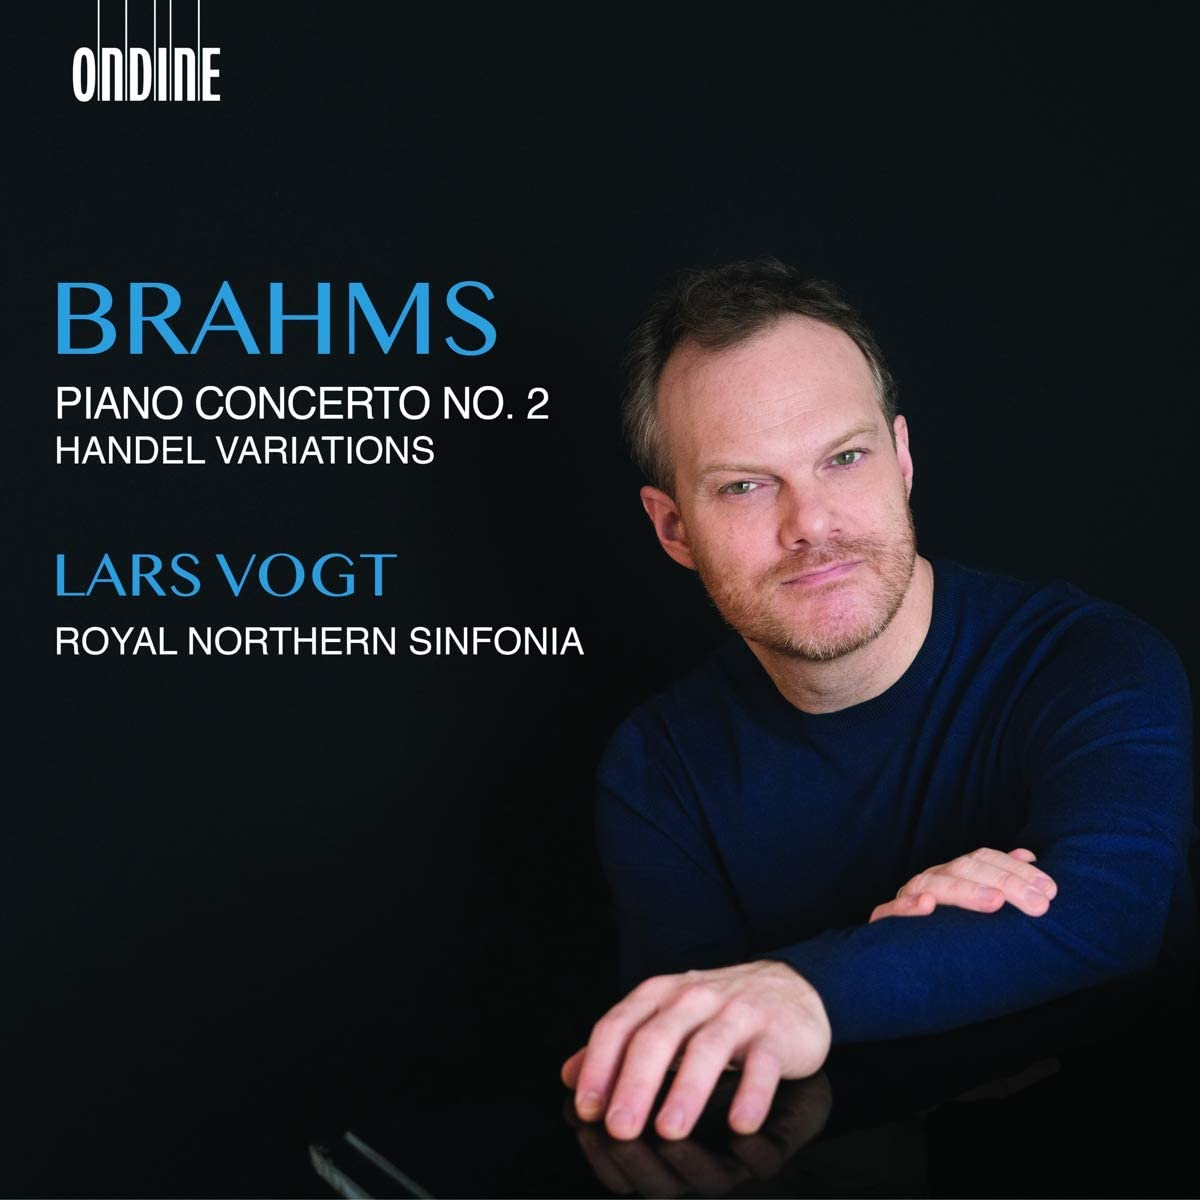 Review of BRAHMS Piano Concerto No 2. Handel Variations (Lars Vogt)